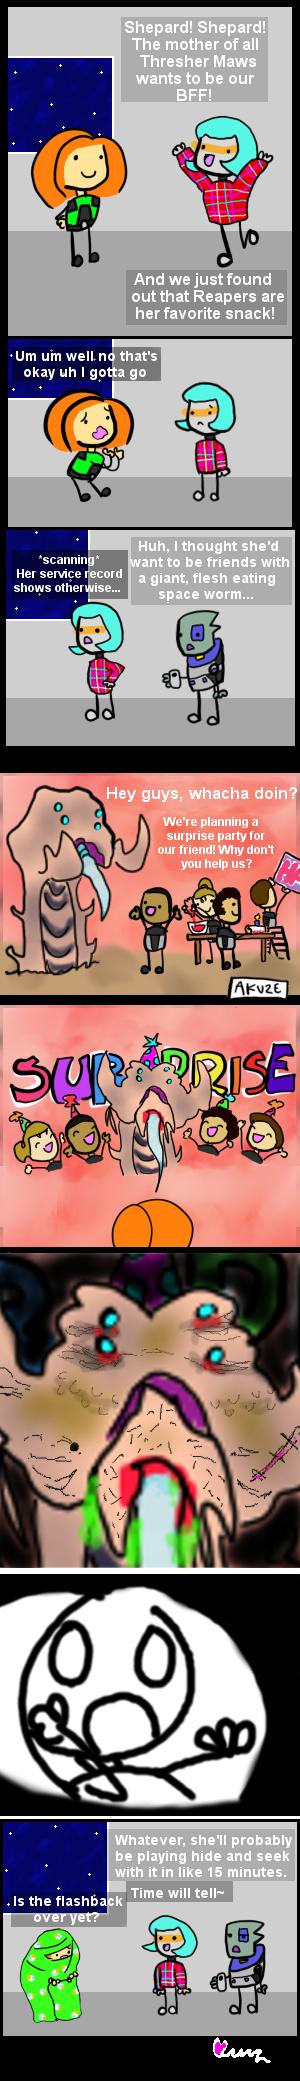 SURPRISE! FLASHBACK! by sillyshepard